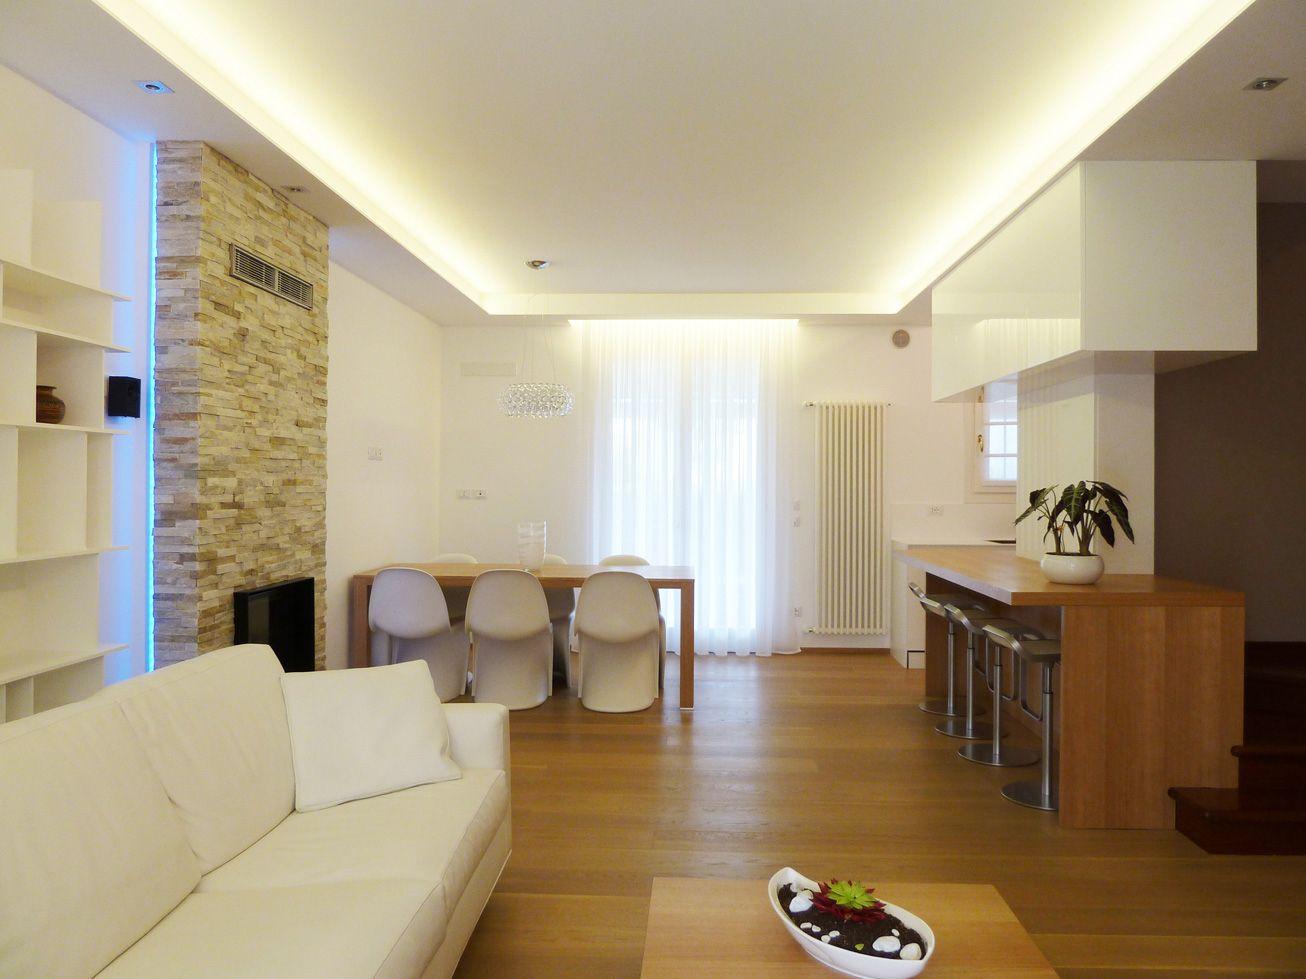 uno splendido soggiorno illuminato da strisce led bianche  strisce led  Pinterest  Strisce ...